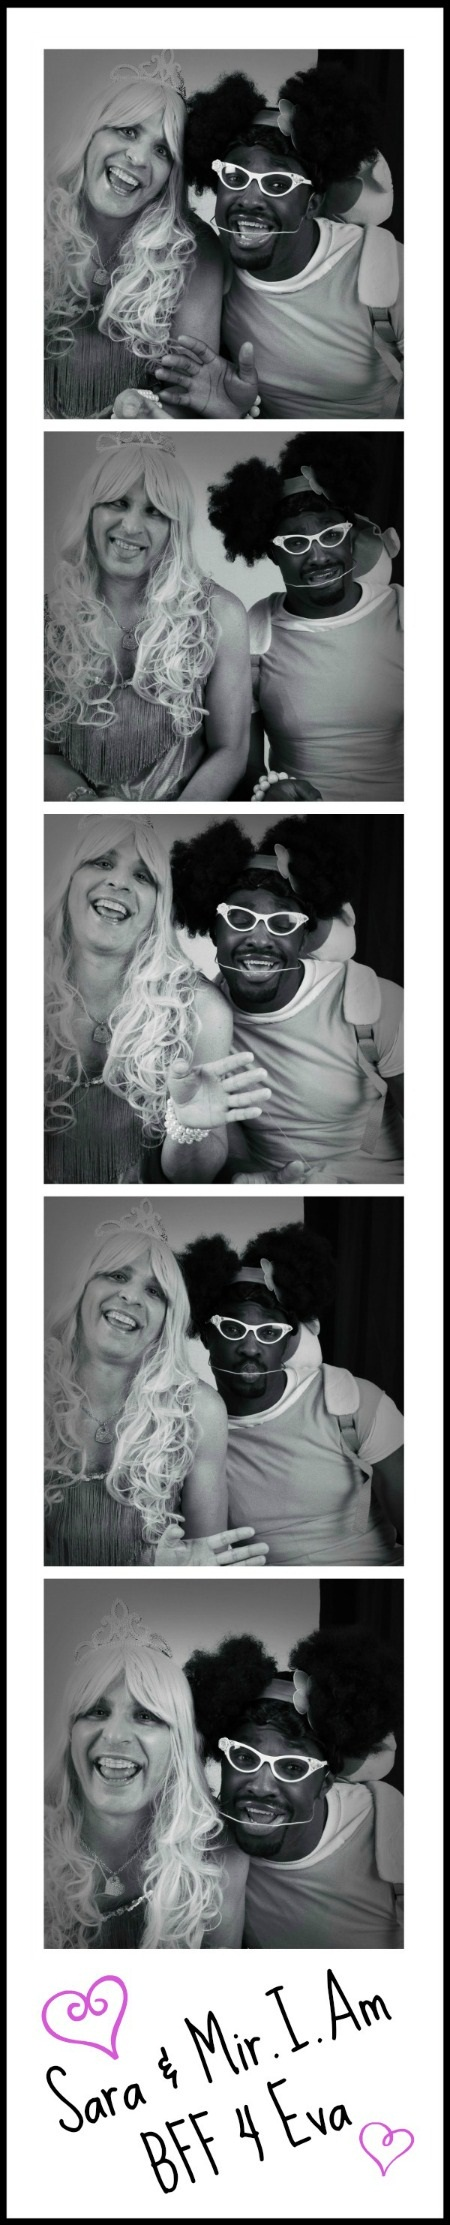 Jimmy Fallon Ew Music Video costumes